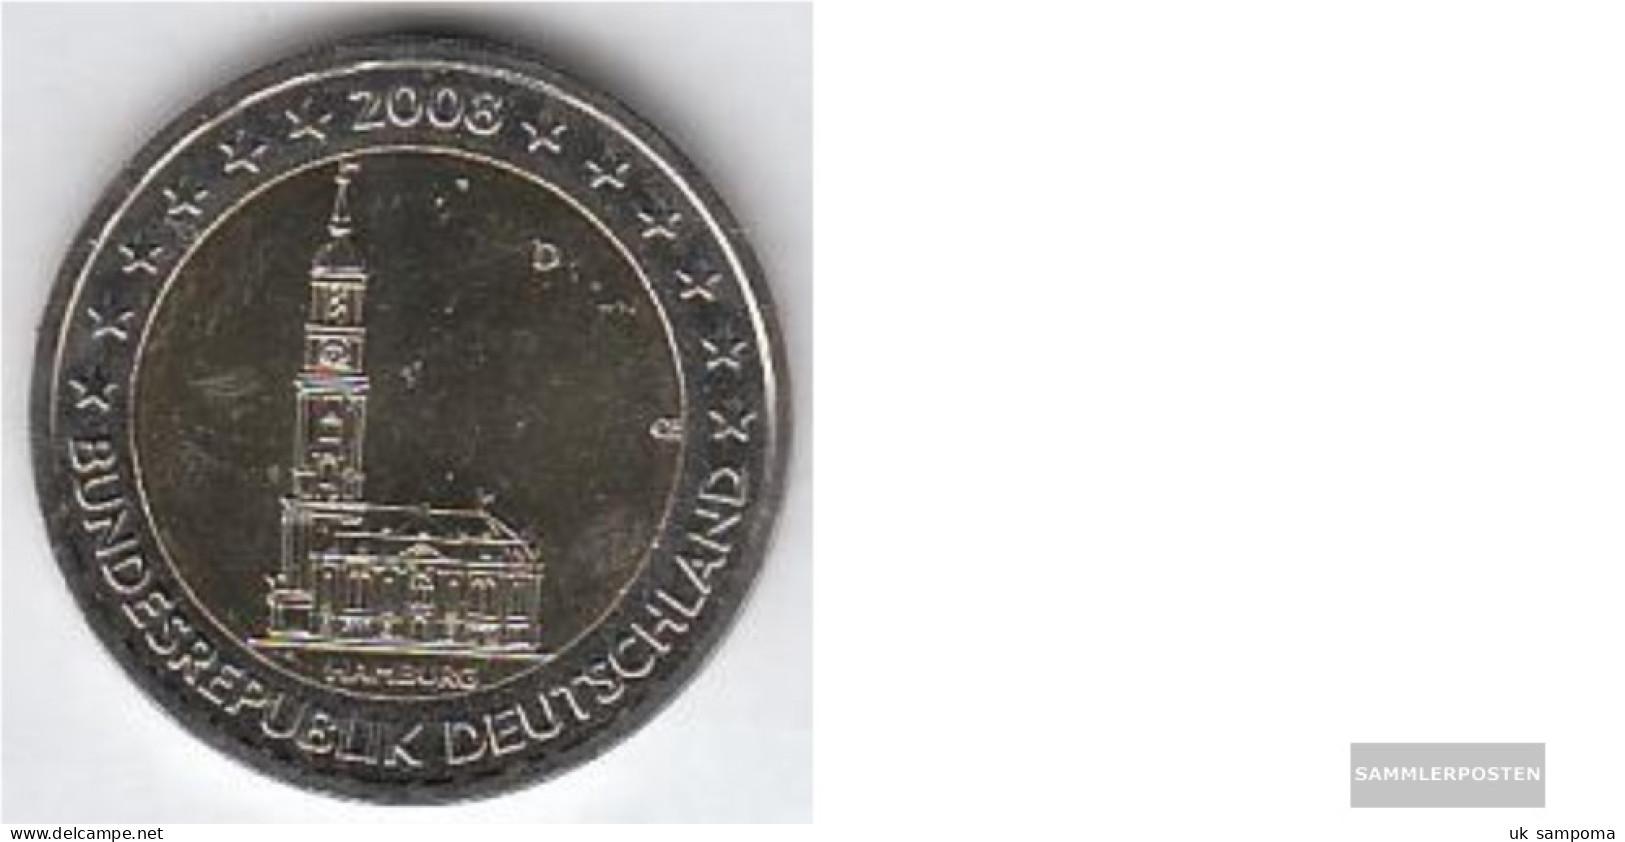 FRD (FR.Germany) Jägernr: 534 2008 D Stgl./unzirkuliert Stgl./unzirkuliert 2008 2 Euro Hamburger Michel - Germany